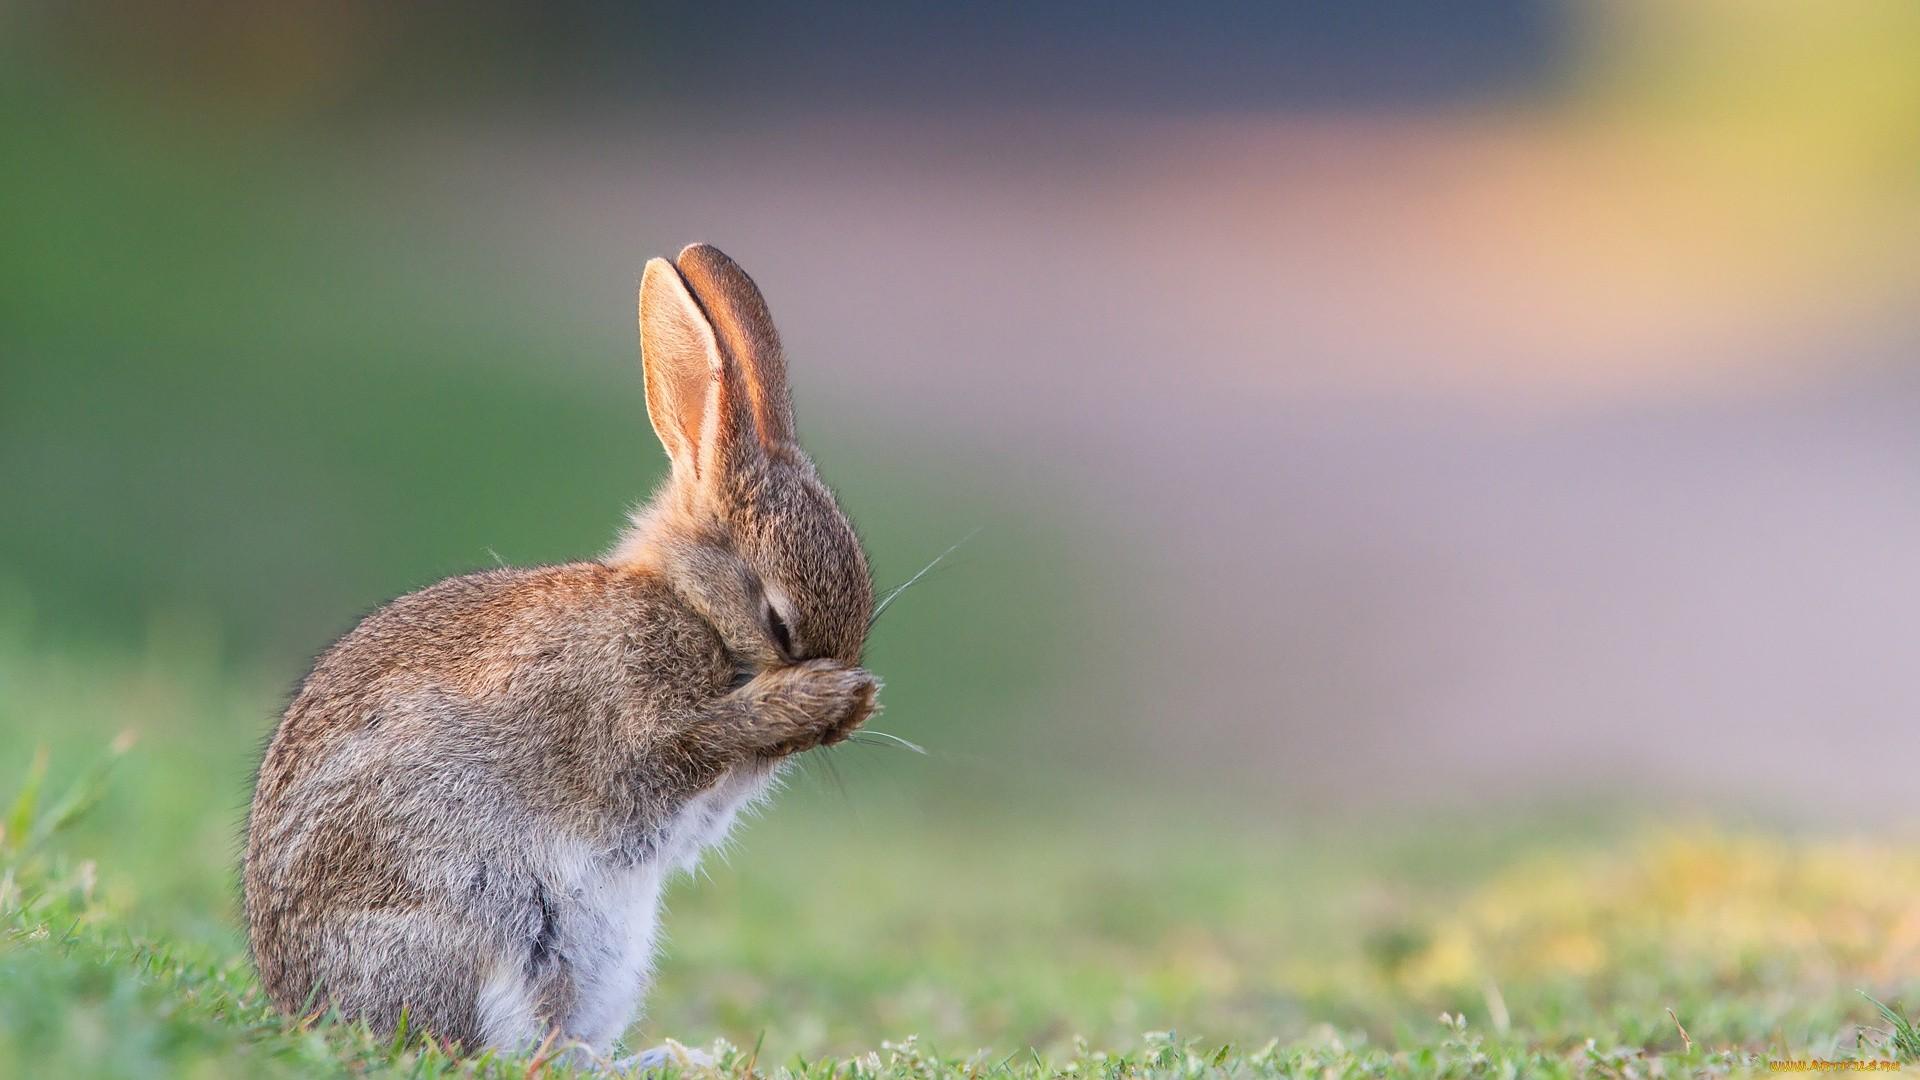 Bunny PC Wallpaper HD